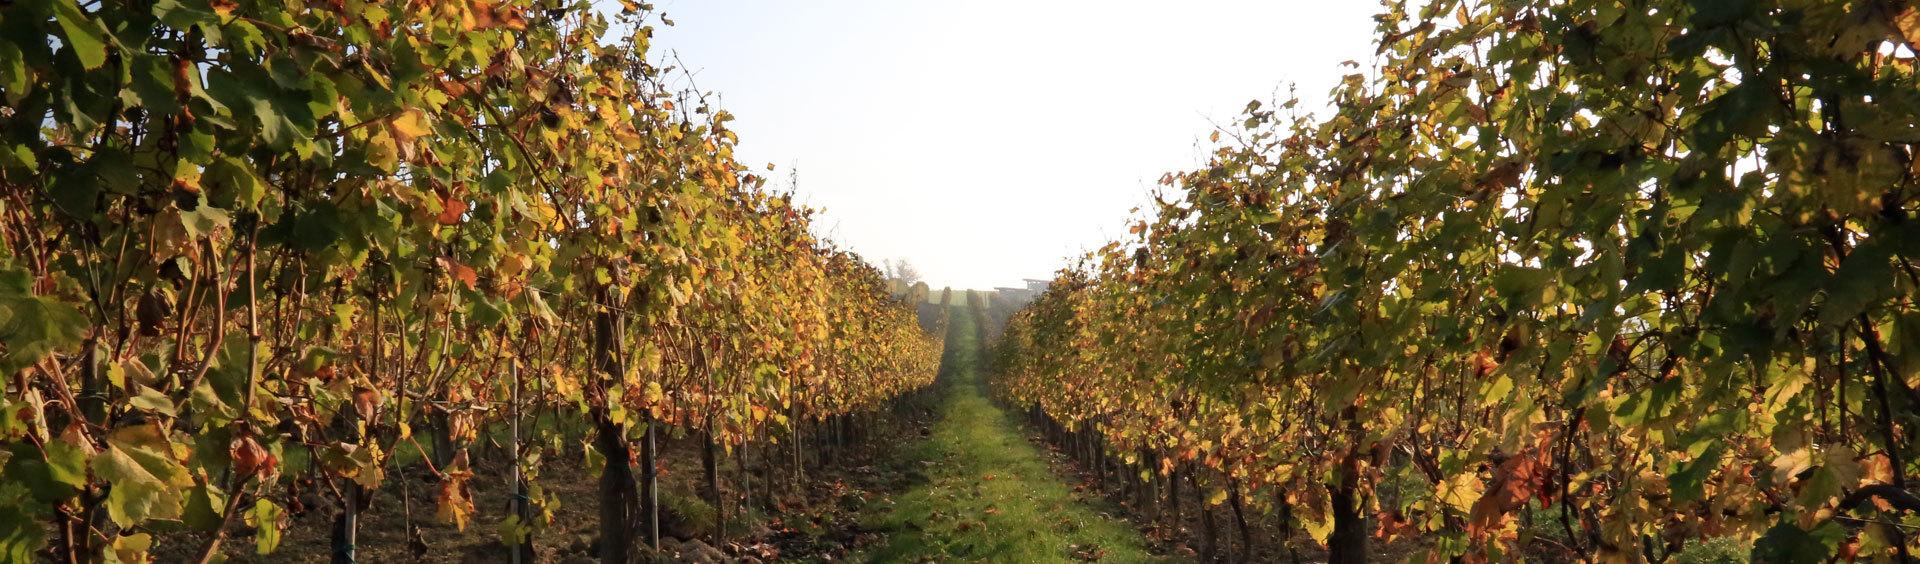 Vino Linea Directa_Wijnhuis_Montemagno